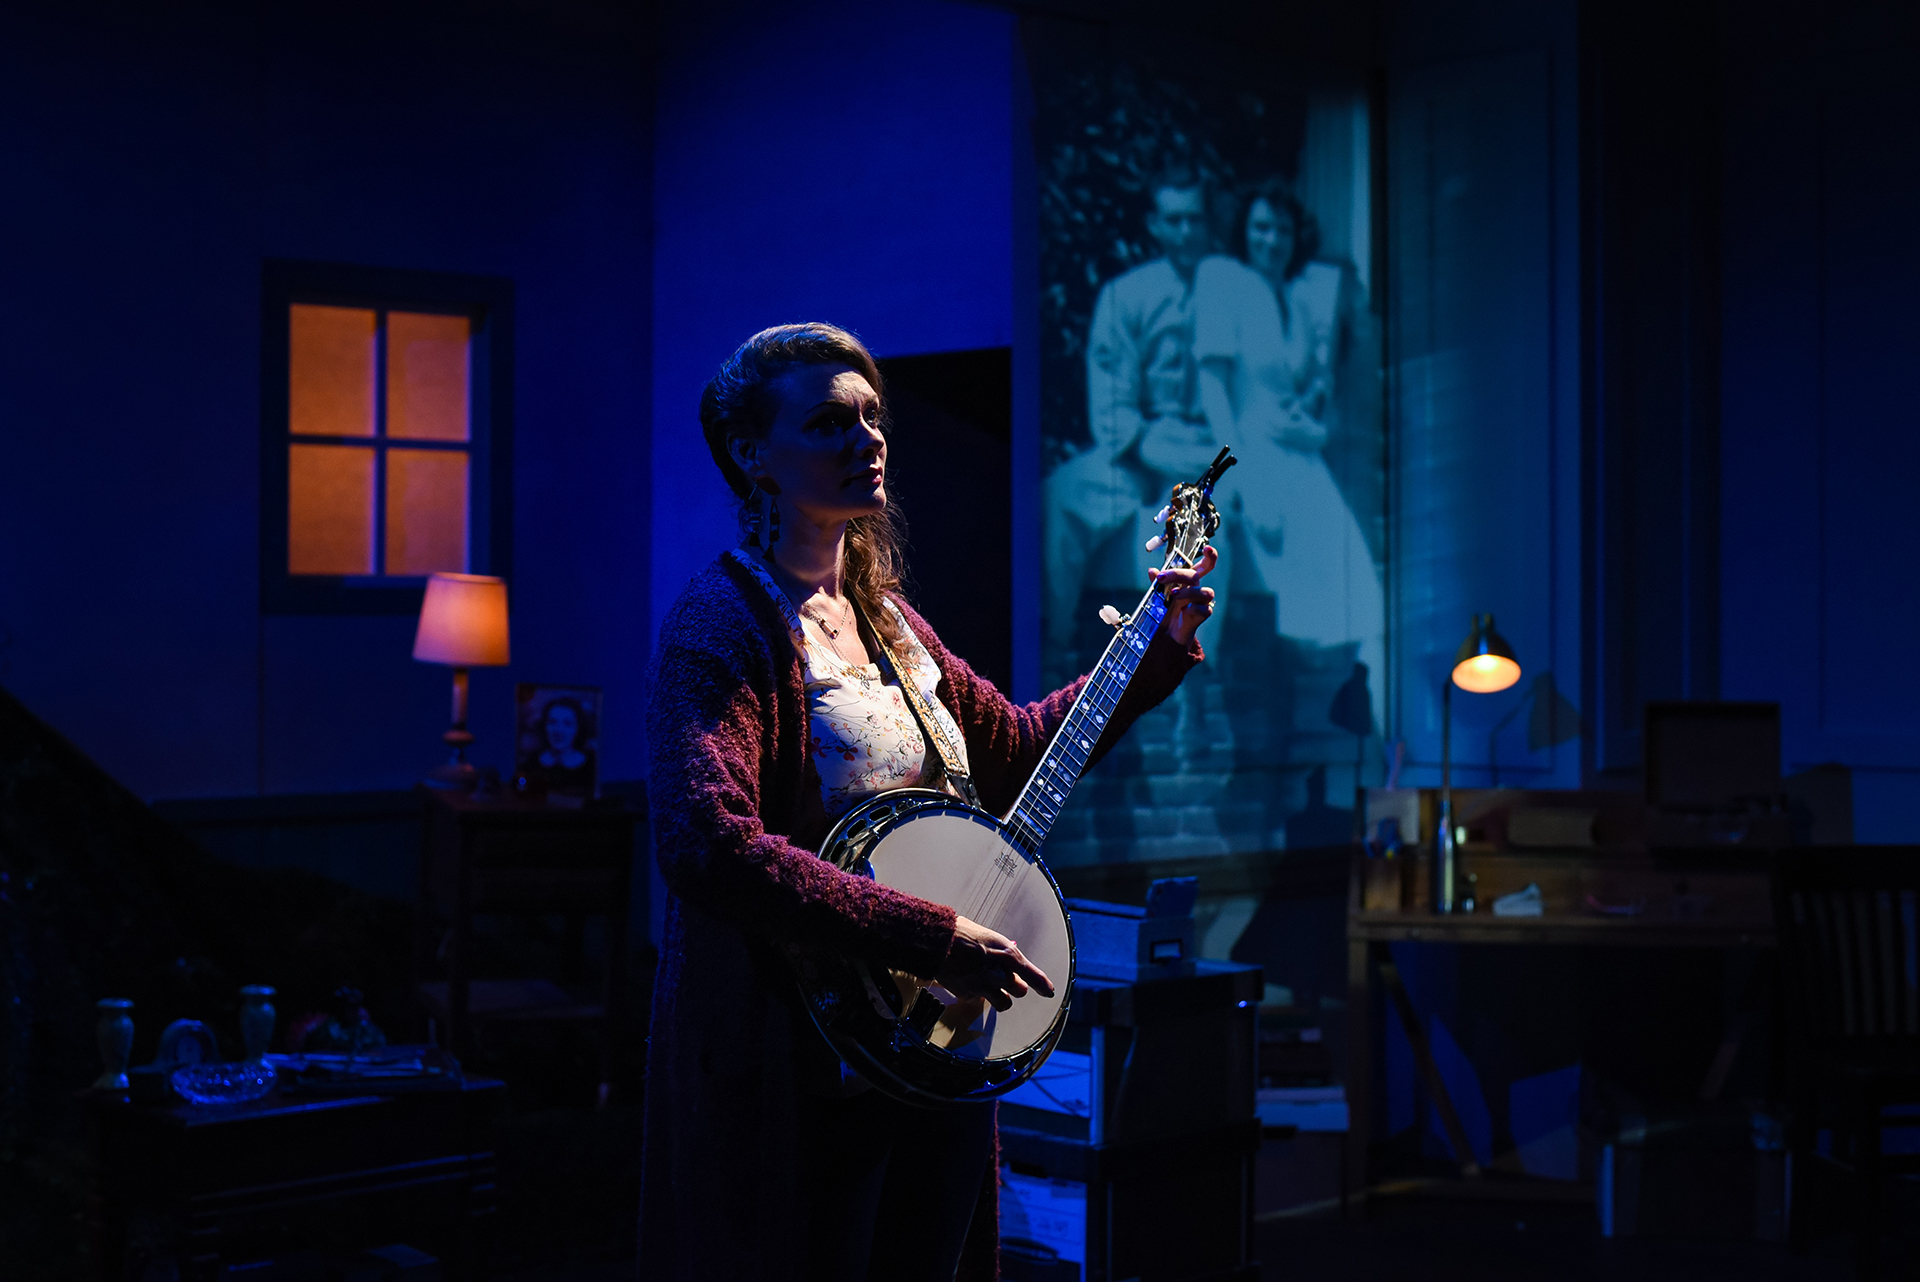 BWW Interview: Miranda Barnett of THE HEATH at Warehouse Theatre